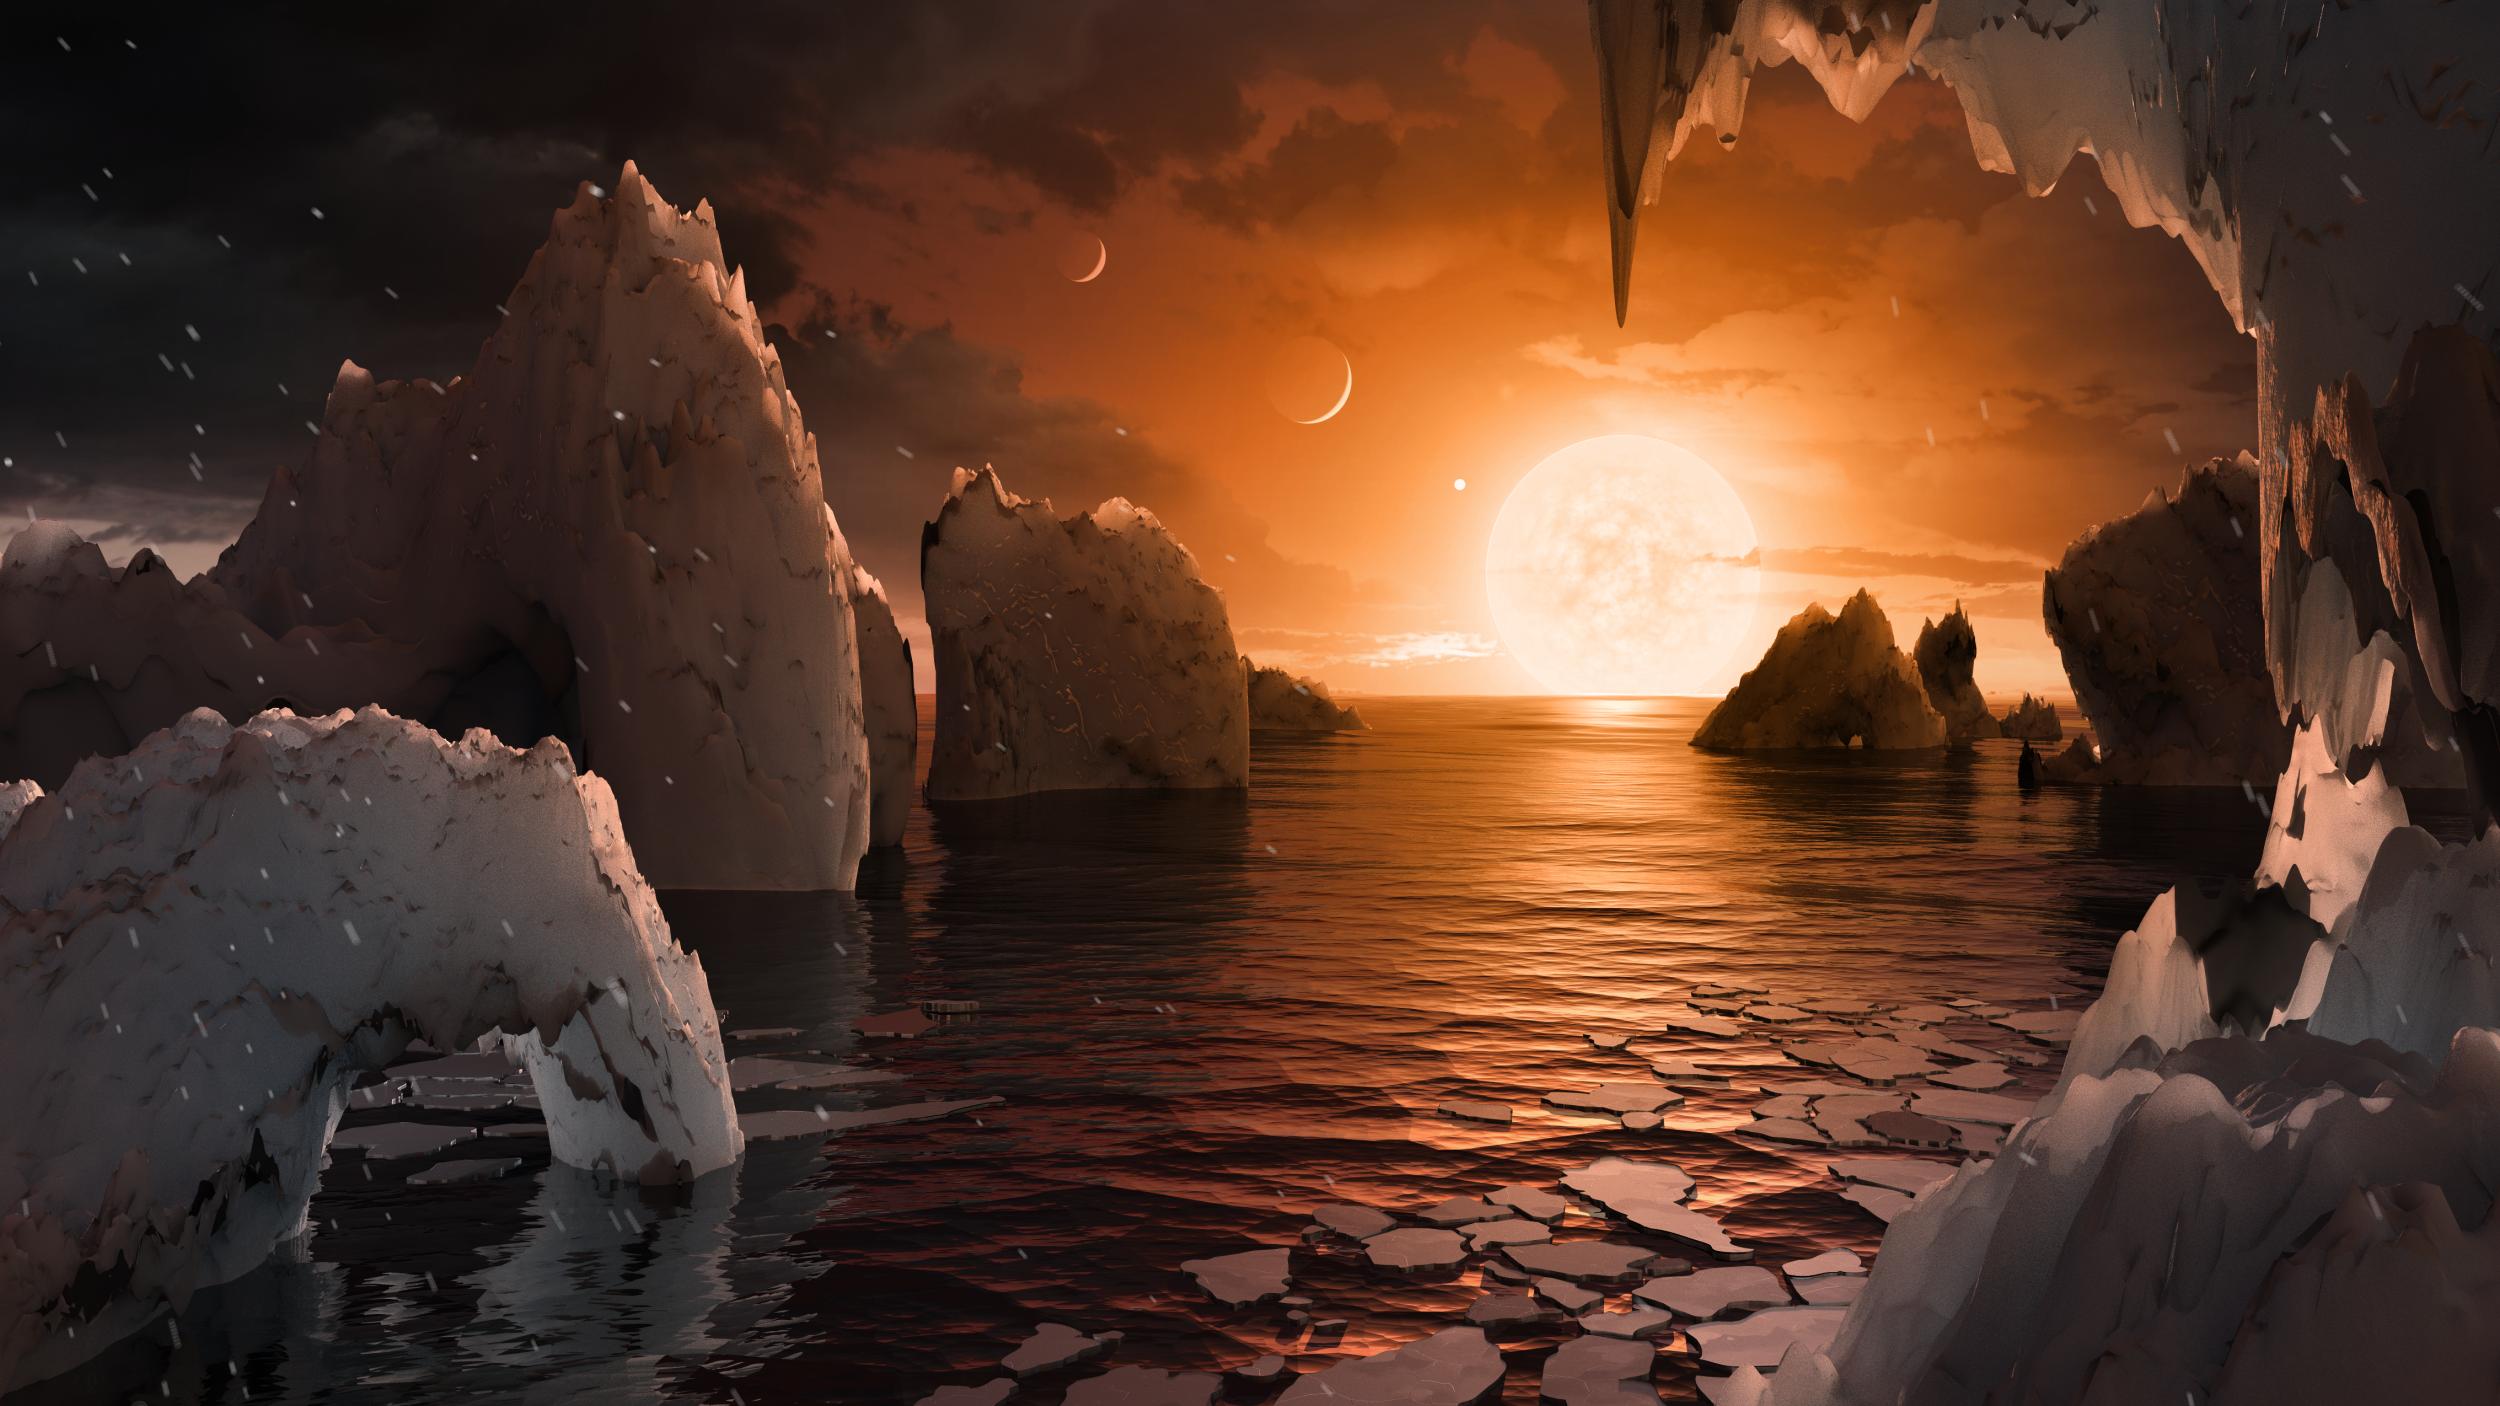 2-22-17 TRAPPIST-1